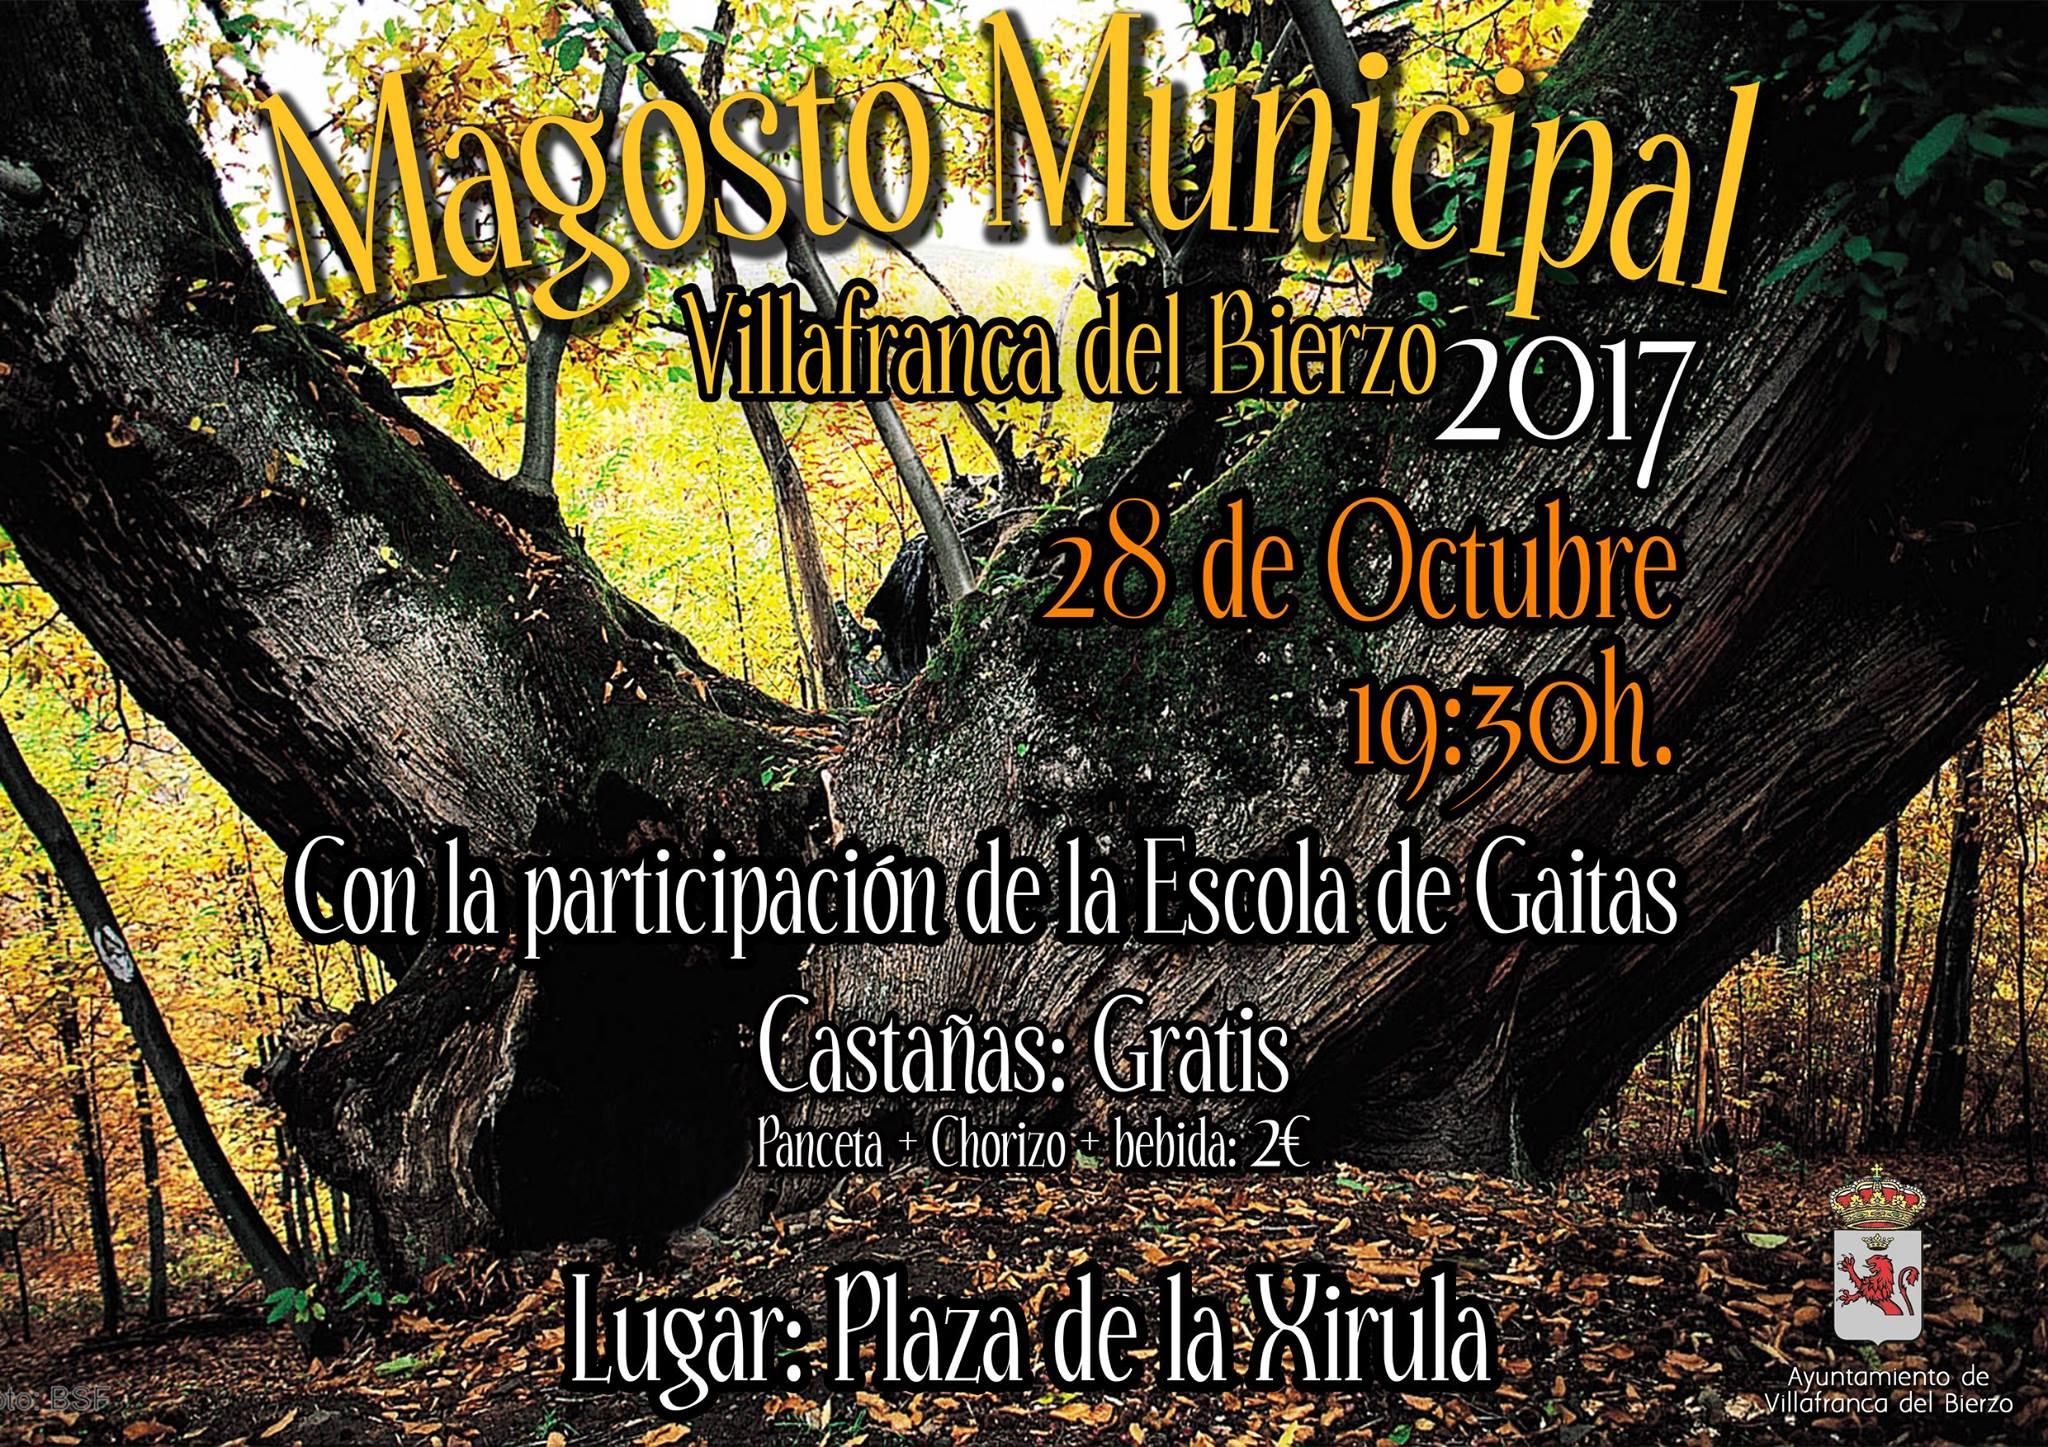 Villafranca organiza su Magosto Municipal 2017 2